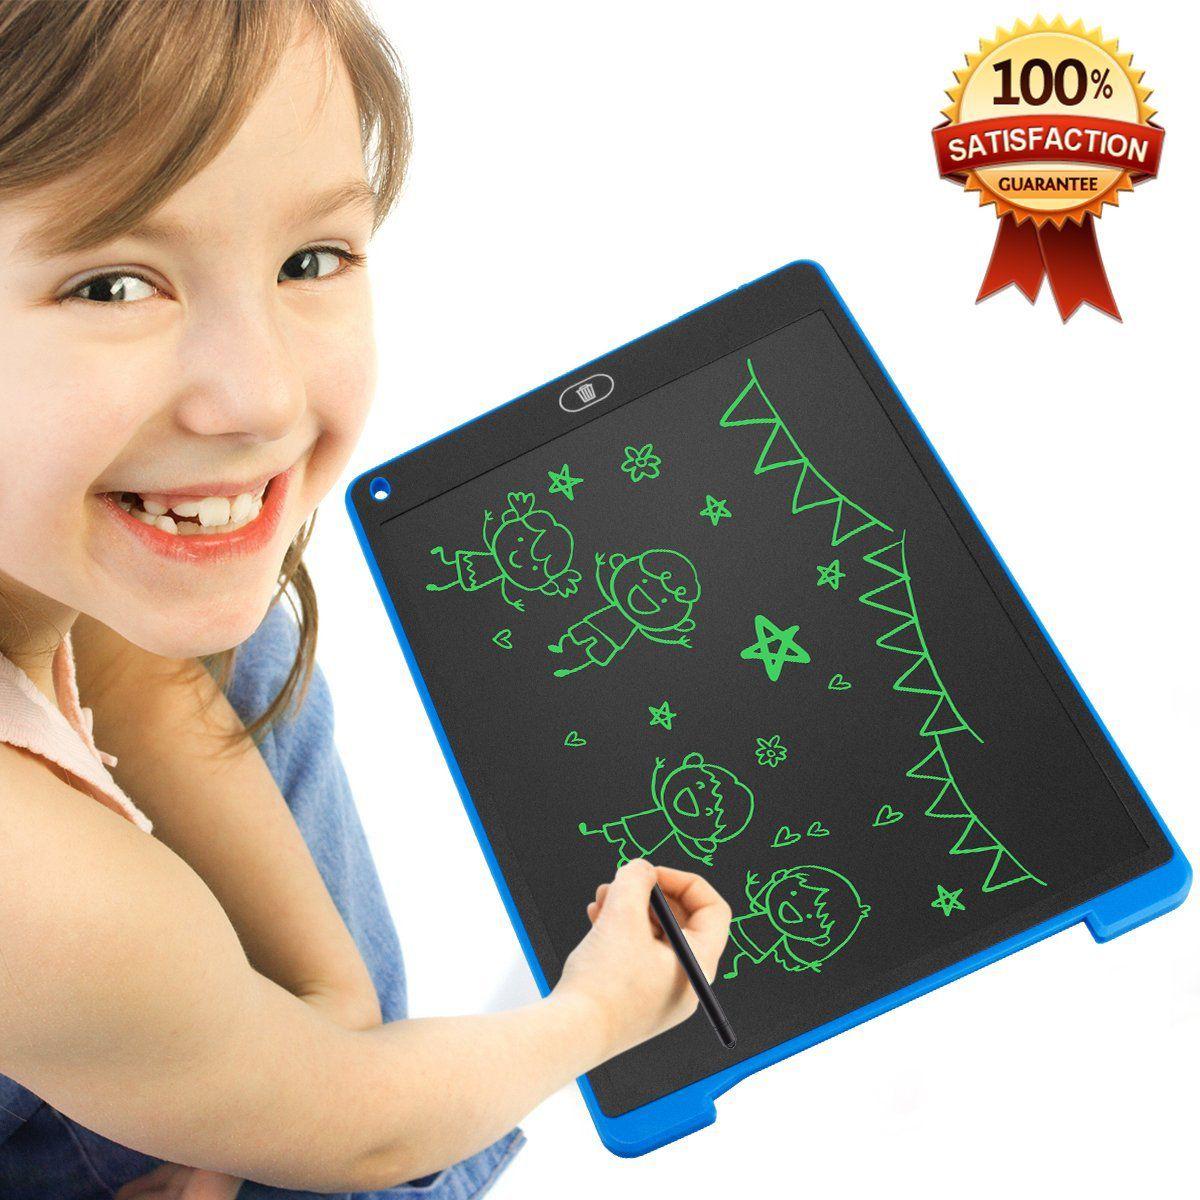 Digital Writing Board YoShine 12 Inch LCD Writing Tablet ...